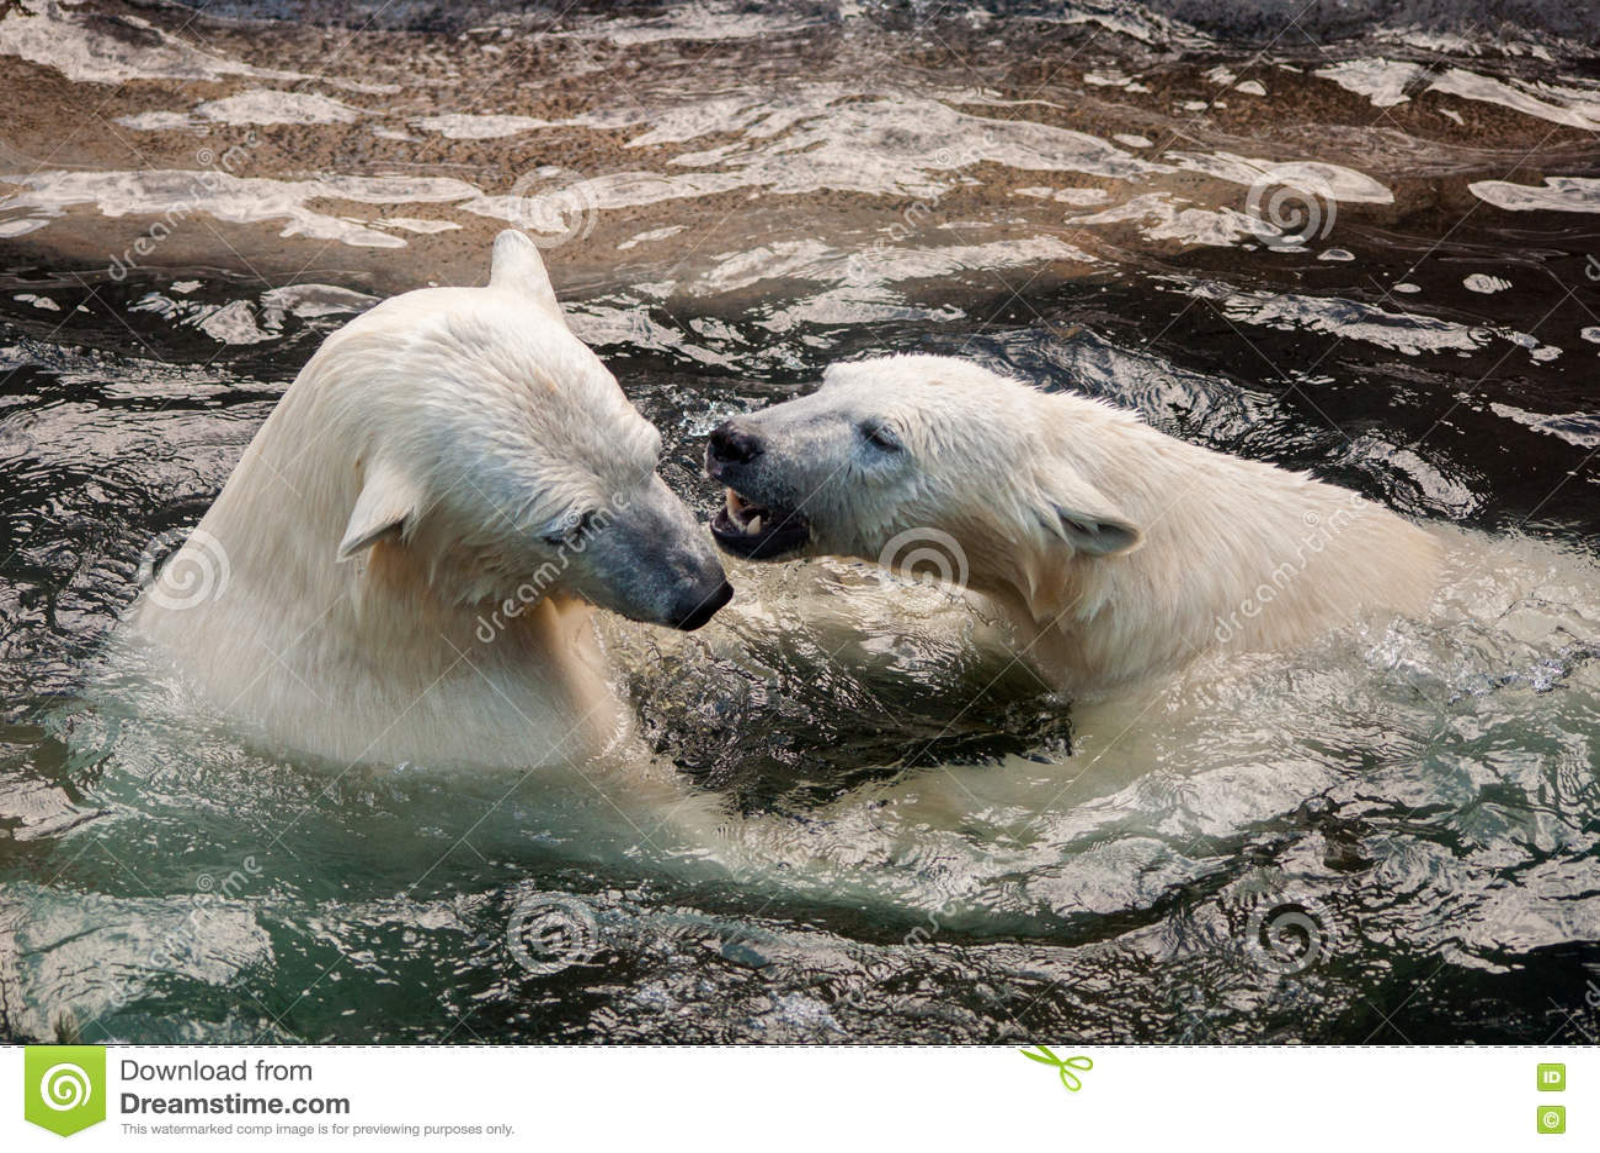 Polar bear cubs playing in water